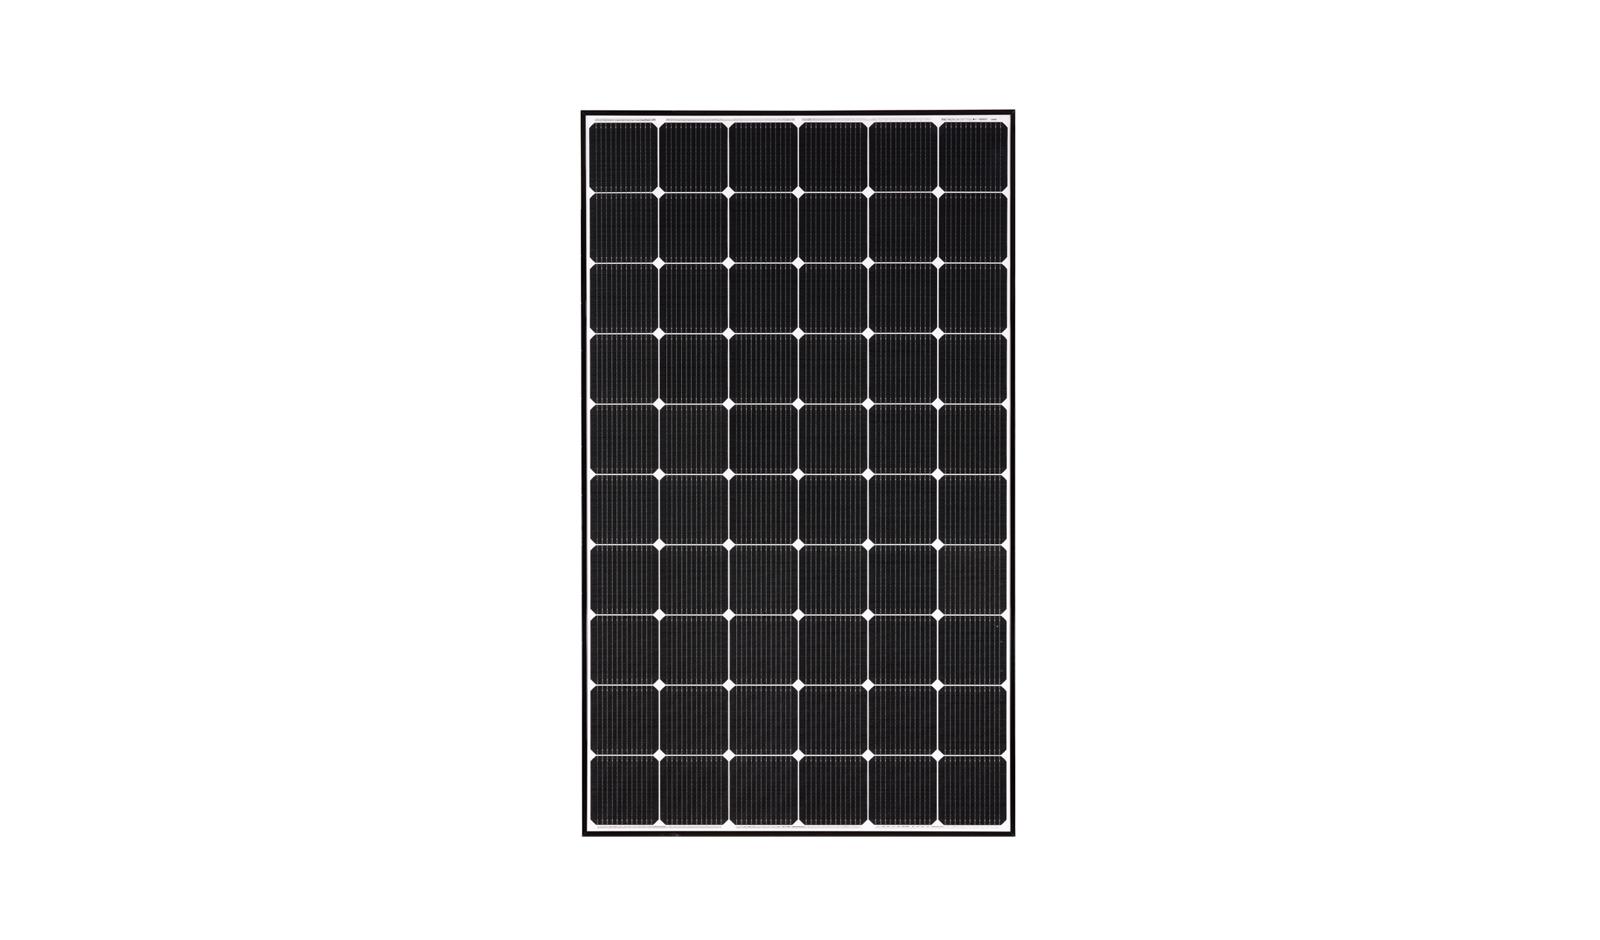 LG NeON 2 350W 60 Cell Mono 1000V BLK/WHT Solar Panel, LG350N1C-V5